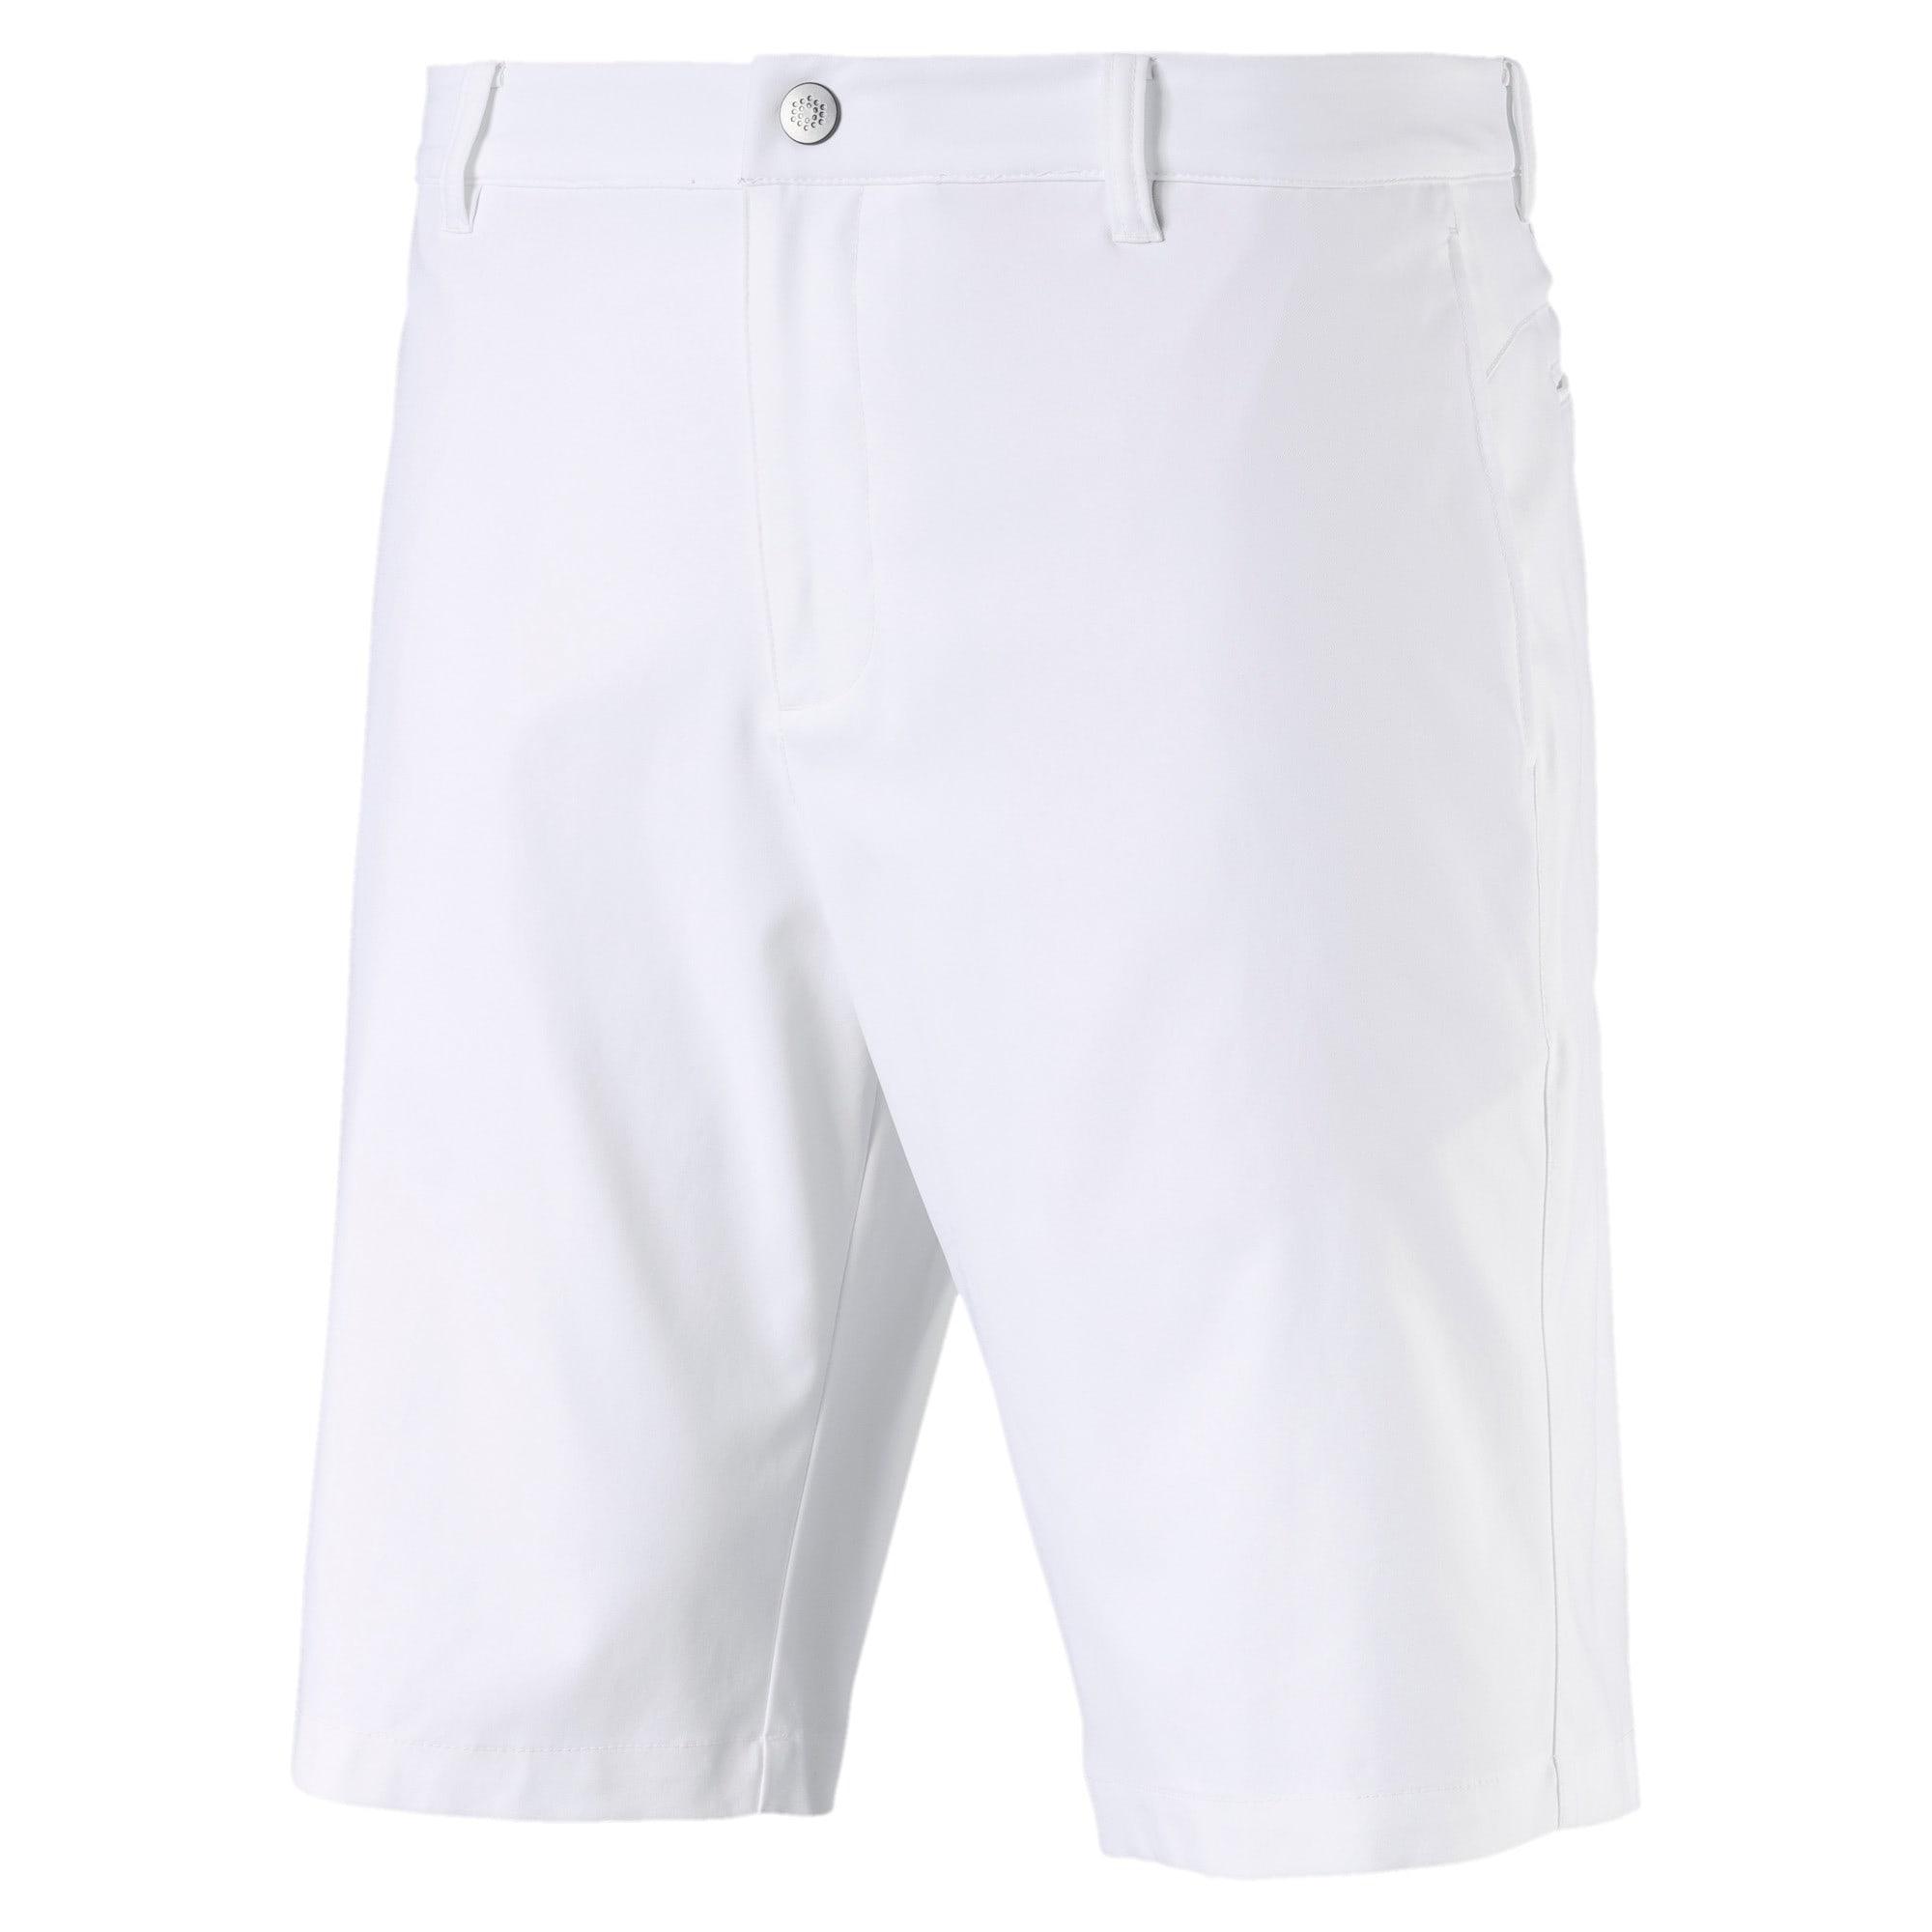 Miniatura 1 de Shorts Jackpot de hombre, Bright White, mediano